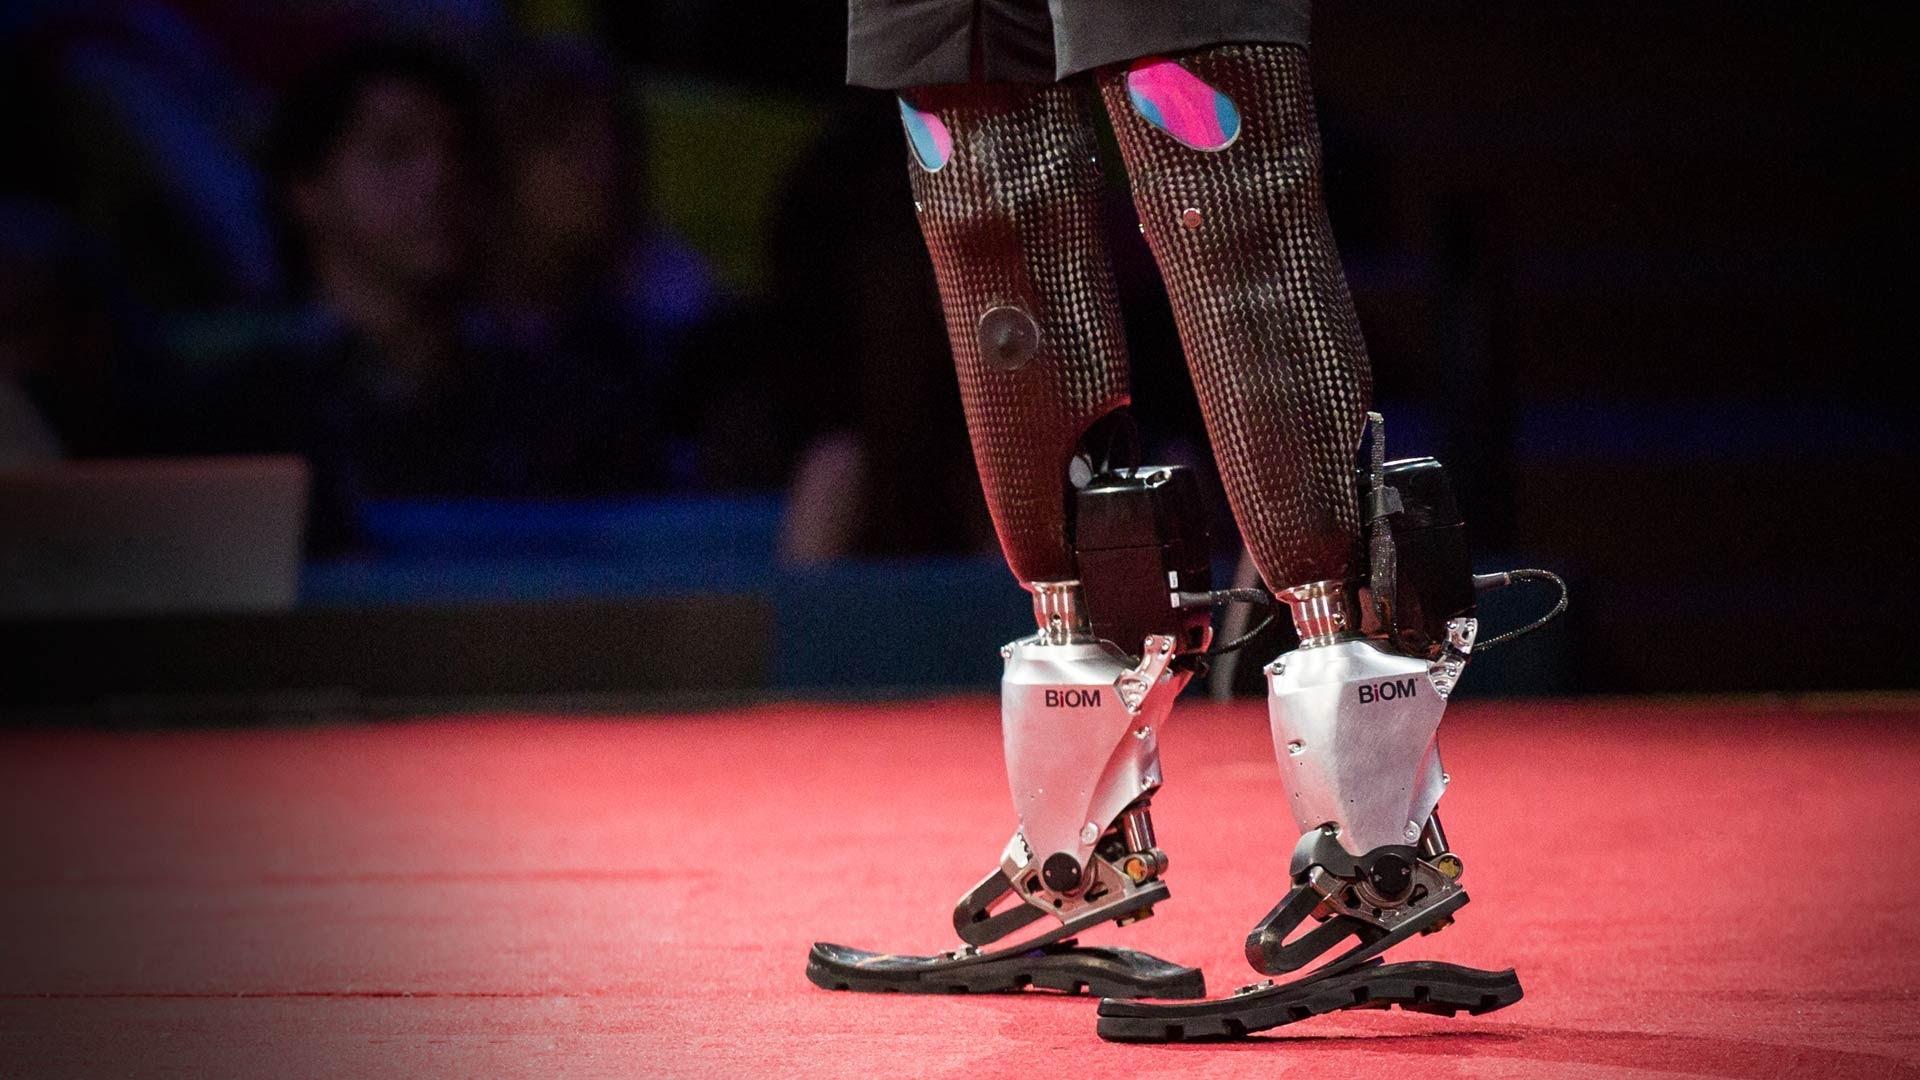 hugh herr robotic legs